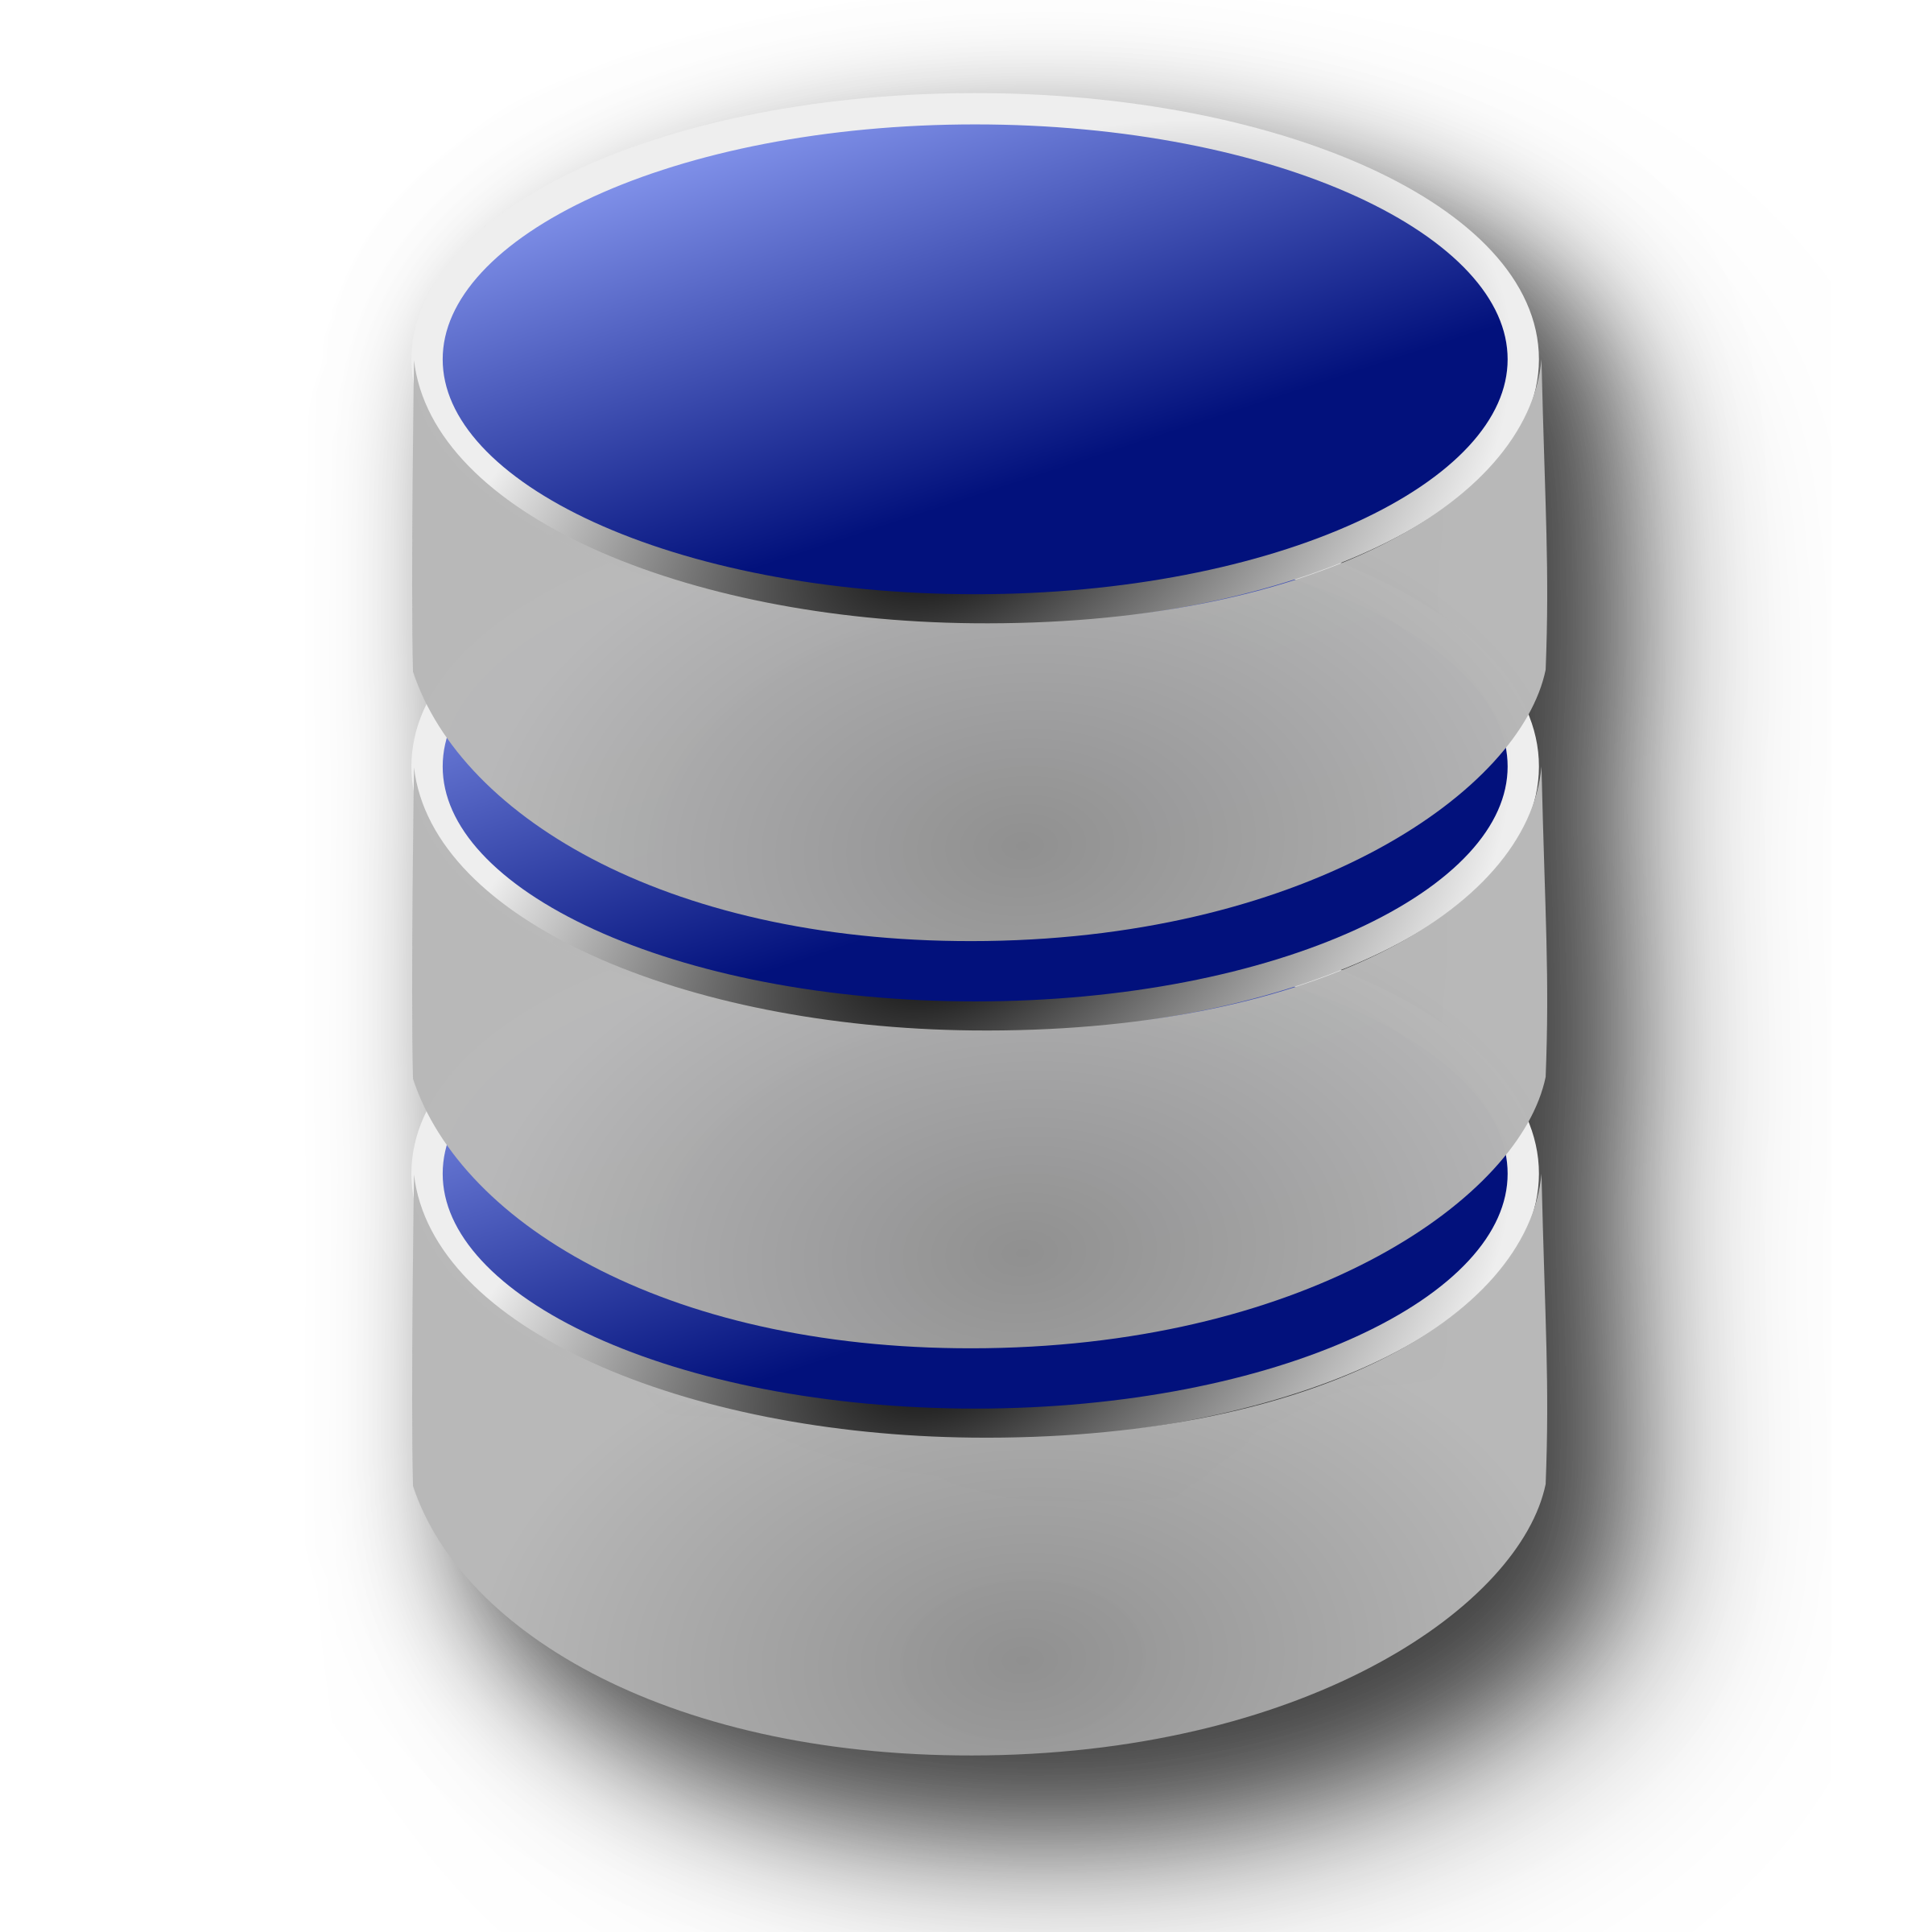 Server PNG - 10469